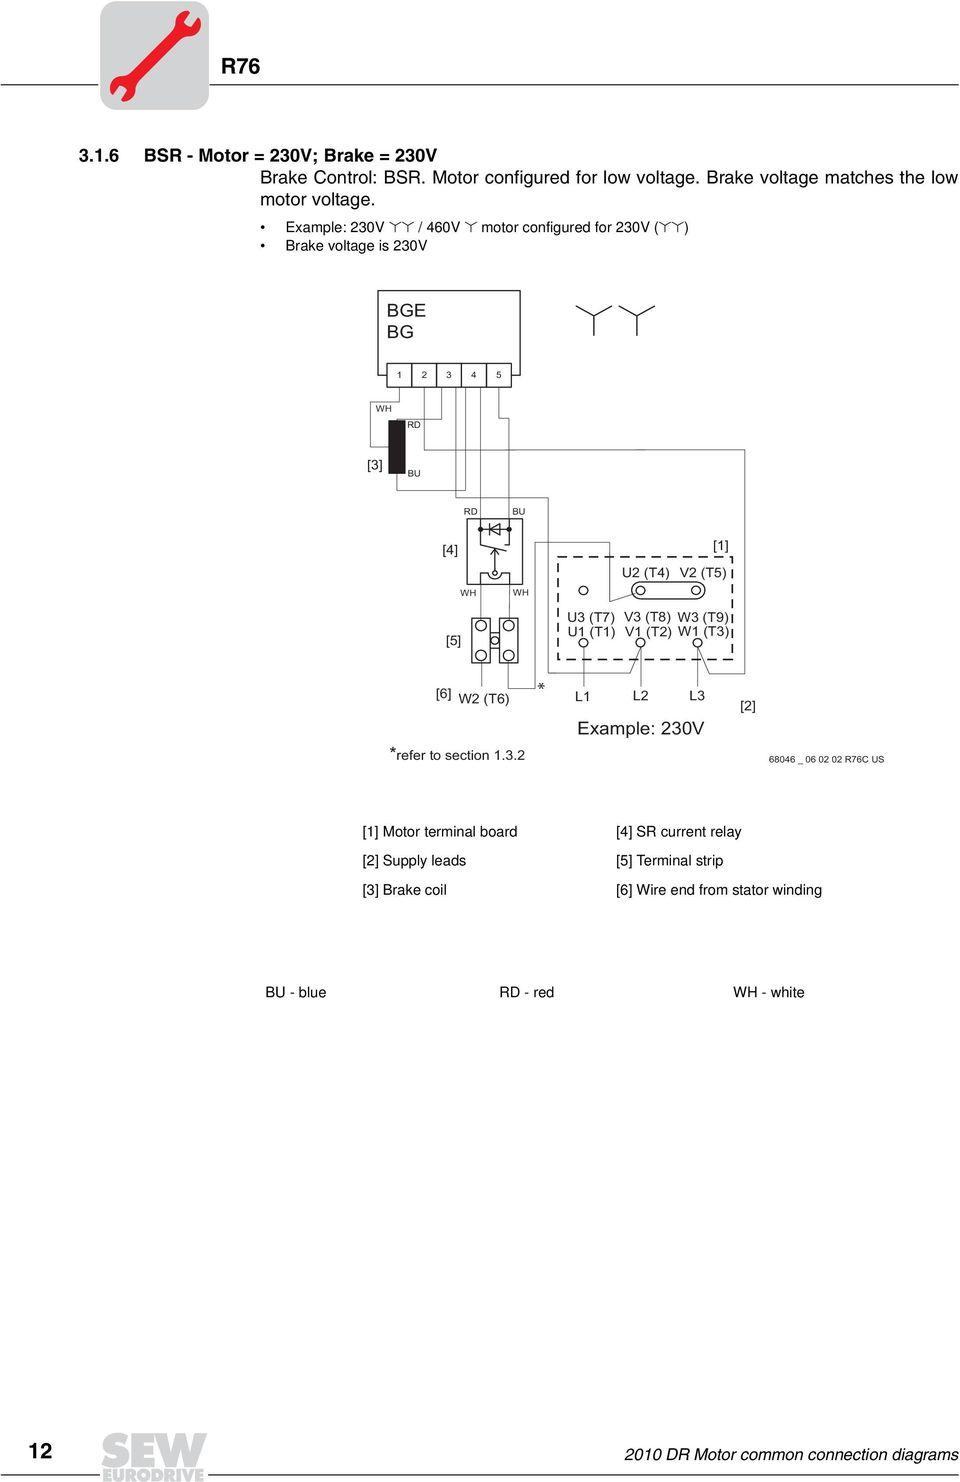 medium resolution of example 230v 460v motor configured for 230v brake voltage is 230v